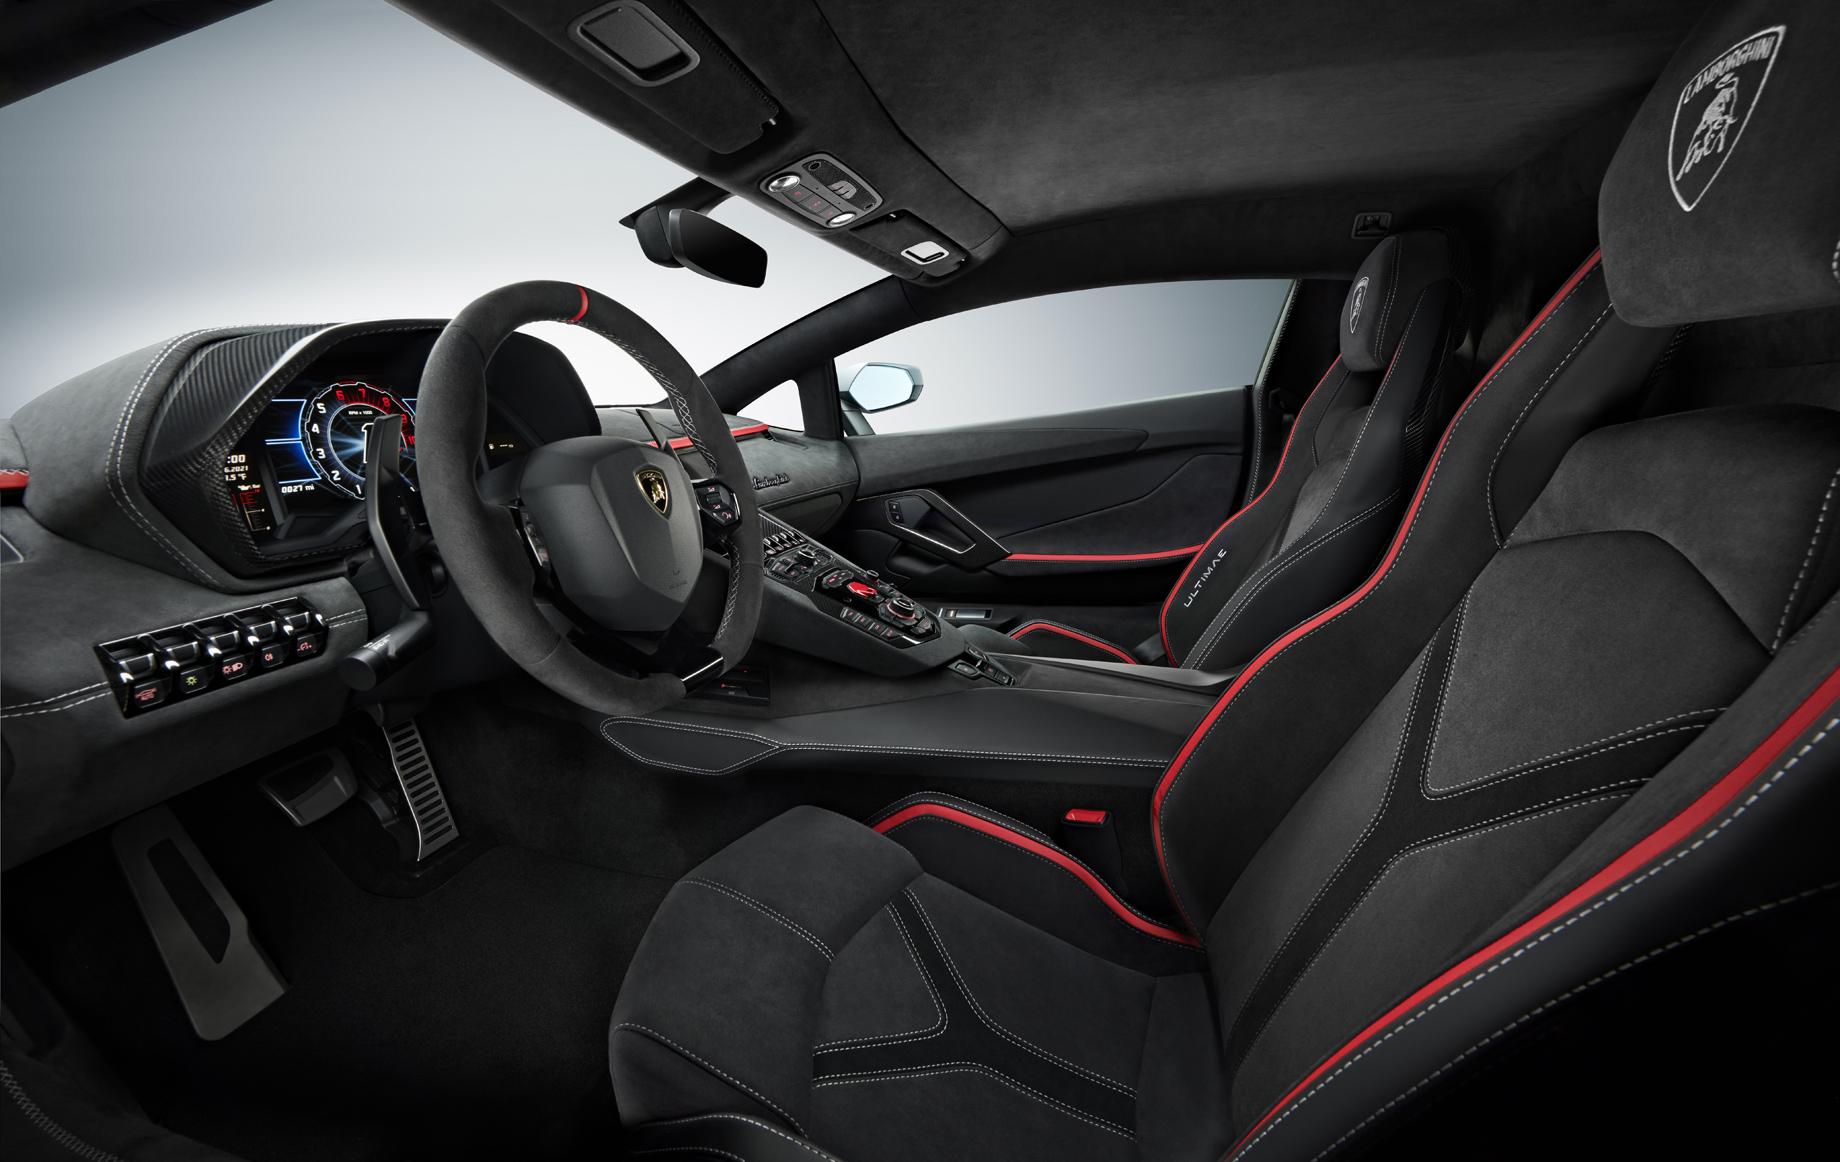 Lamborghini Aventador LP 780-4 Ultimae явился венцом эволюции